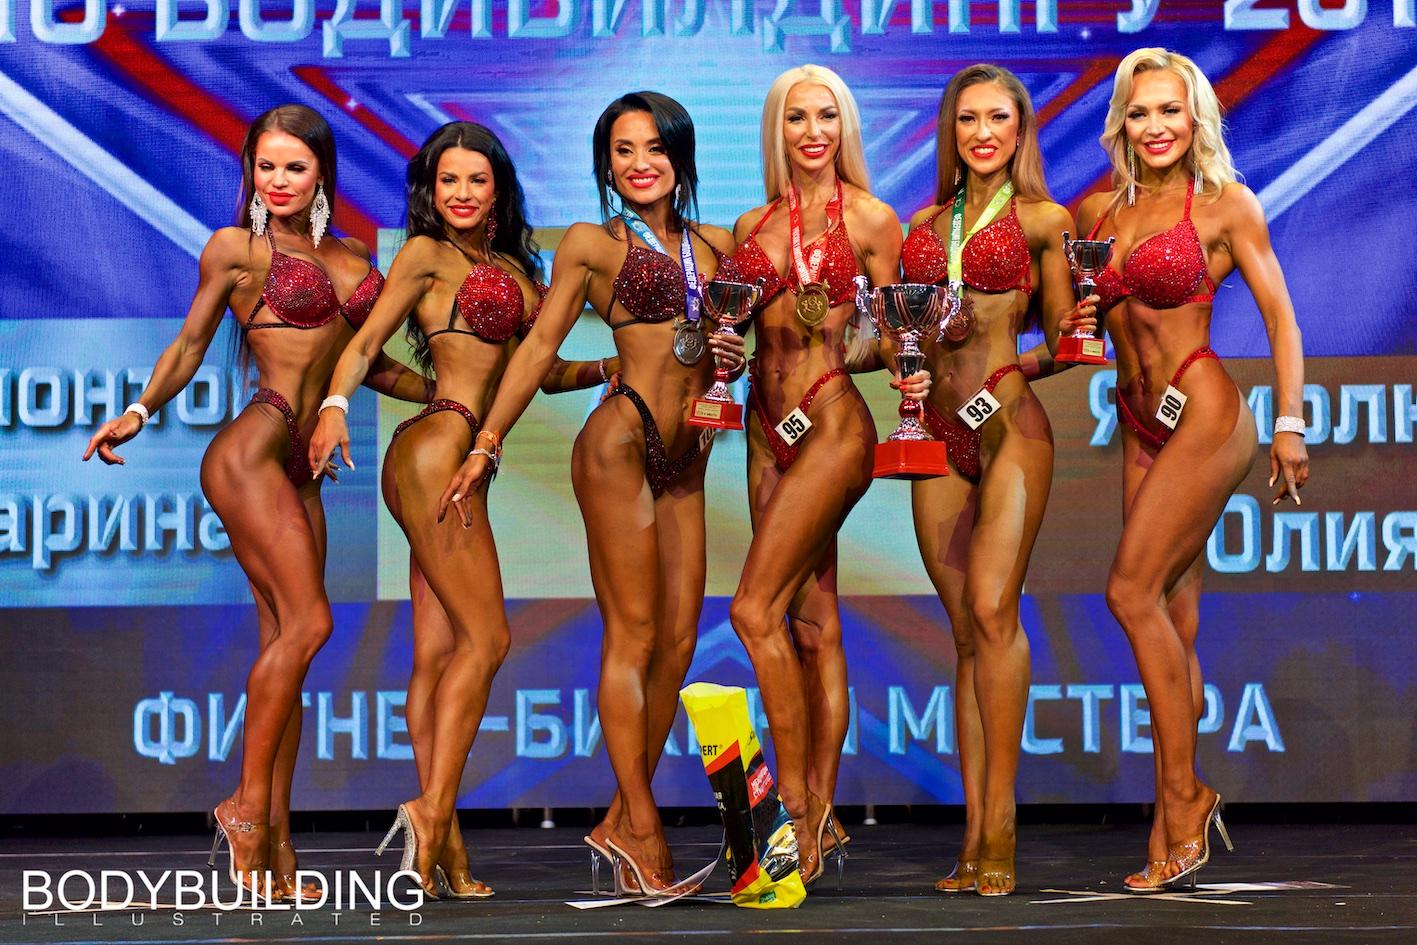 Кубок Москвы по бодибилдингу 2019 фитнес-бикини